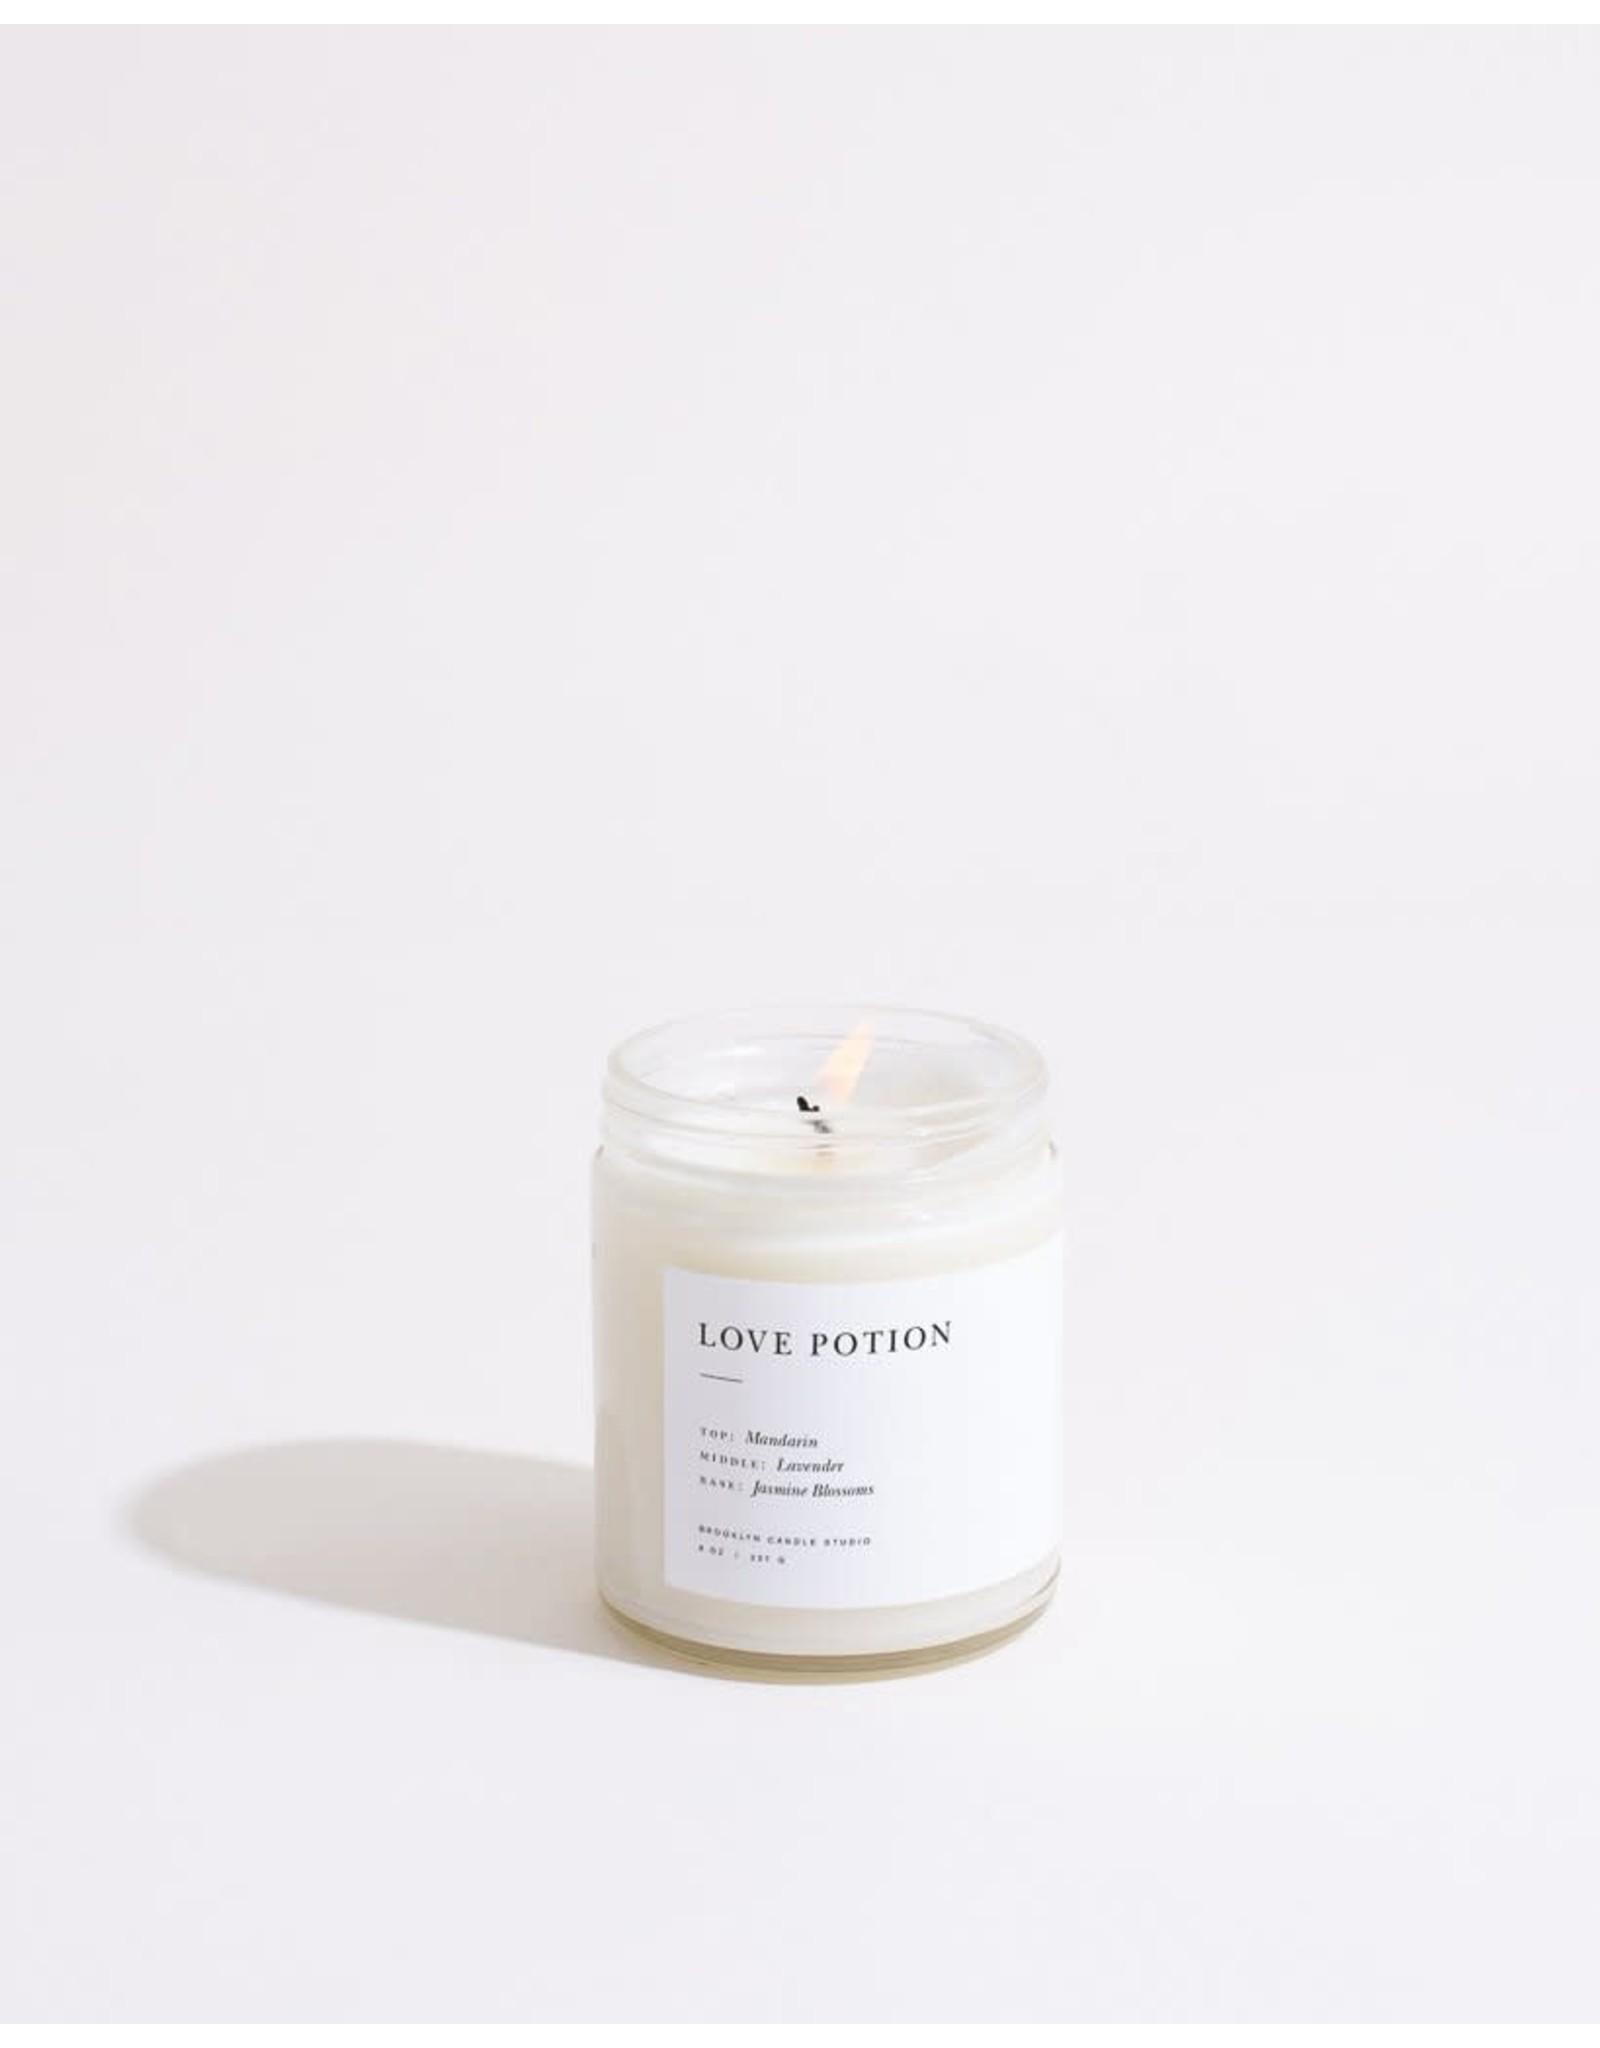 Brooklyn Candle Studio Love Potion - Minimalist Jar Candle - Brooklyn Candle Studio